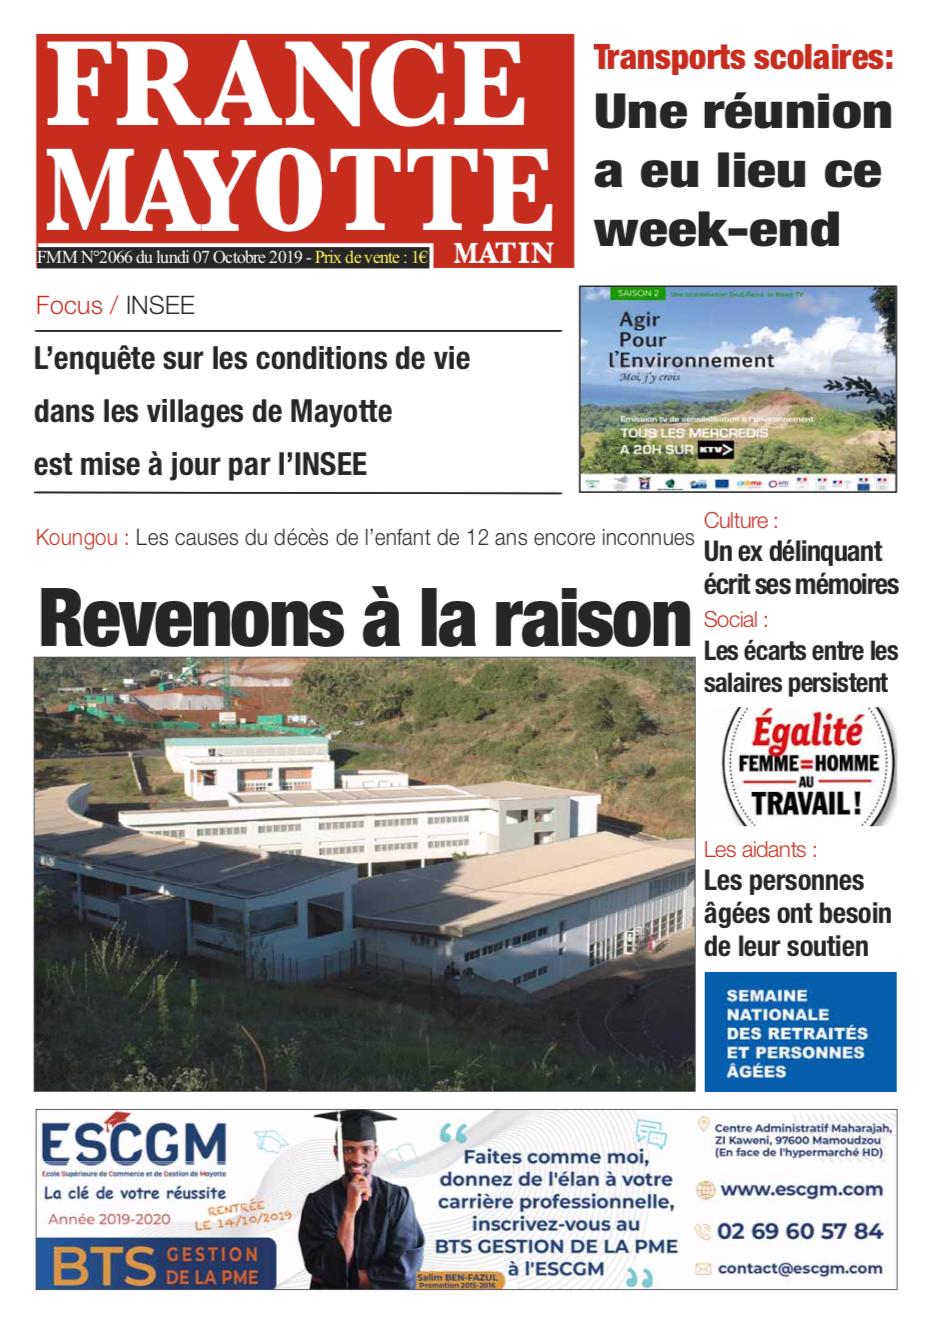 France Mayotte Lundi 7 octobre 2019